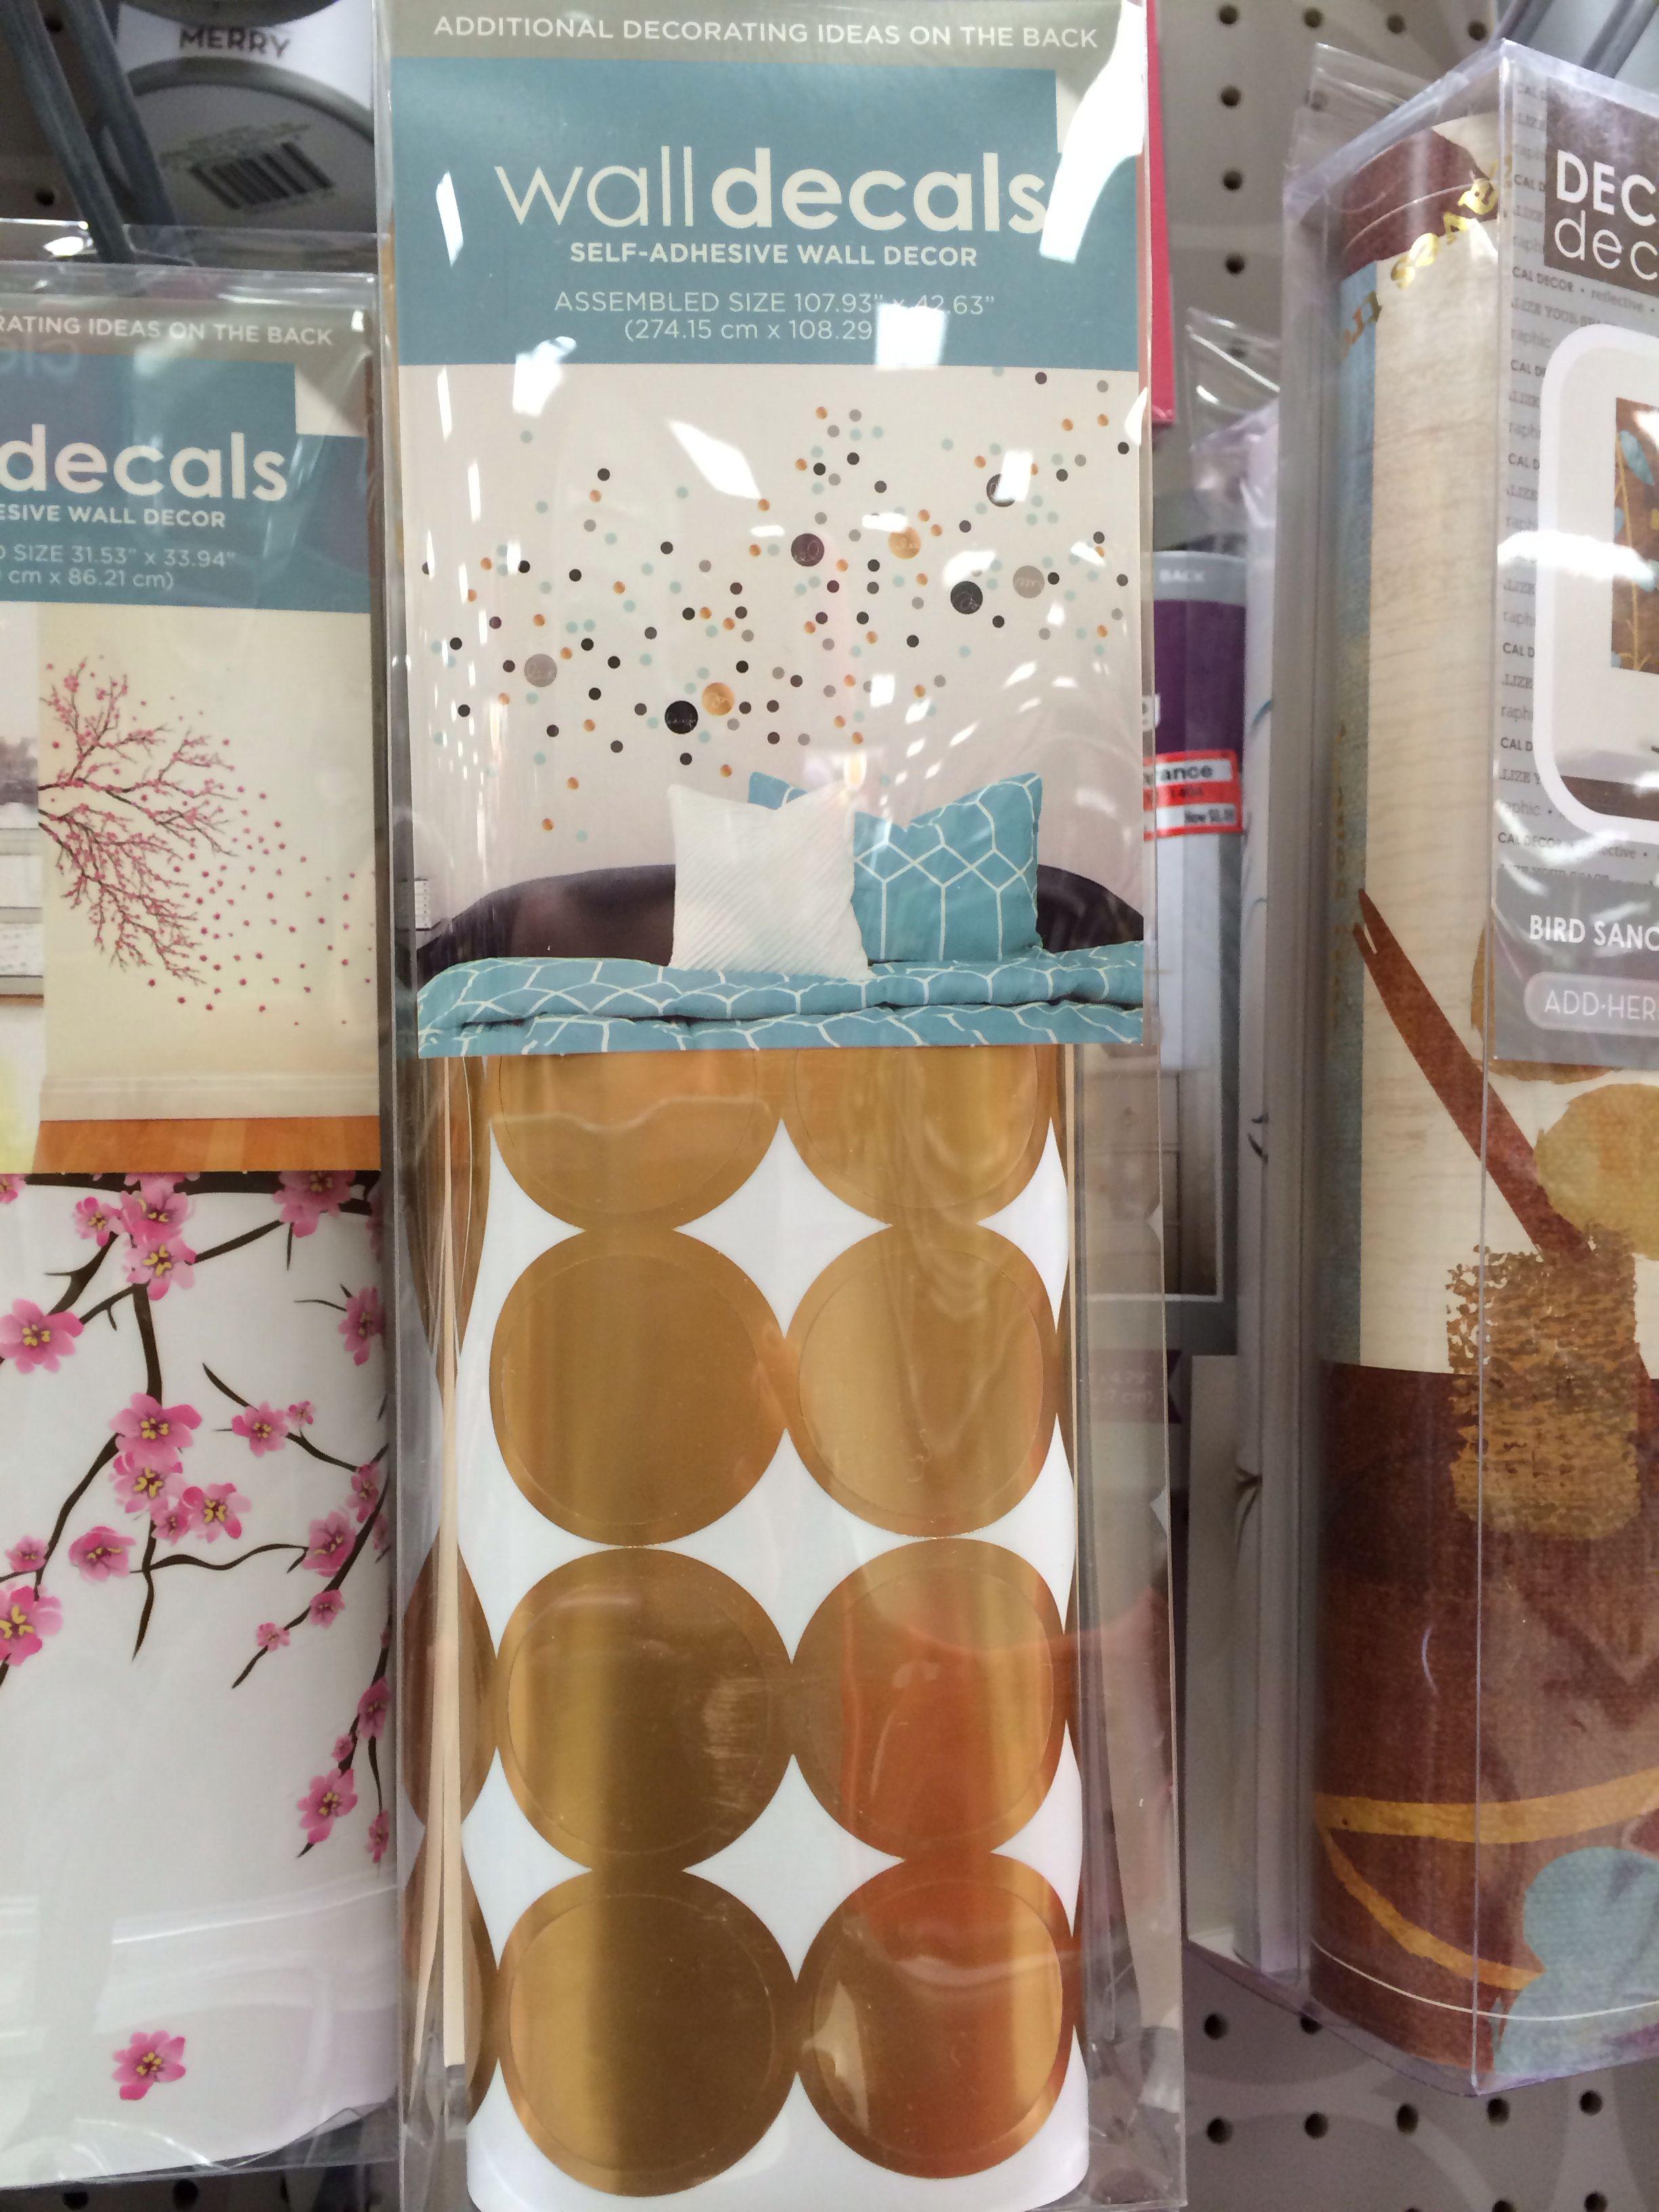 Gold Dot Wall Decals At Target!